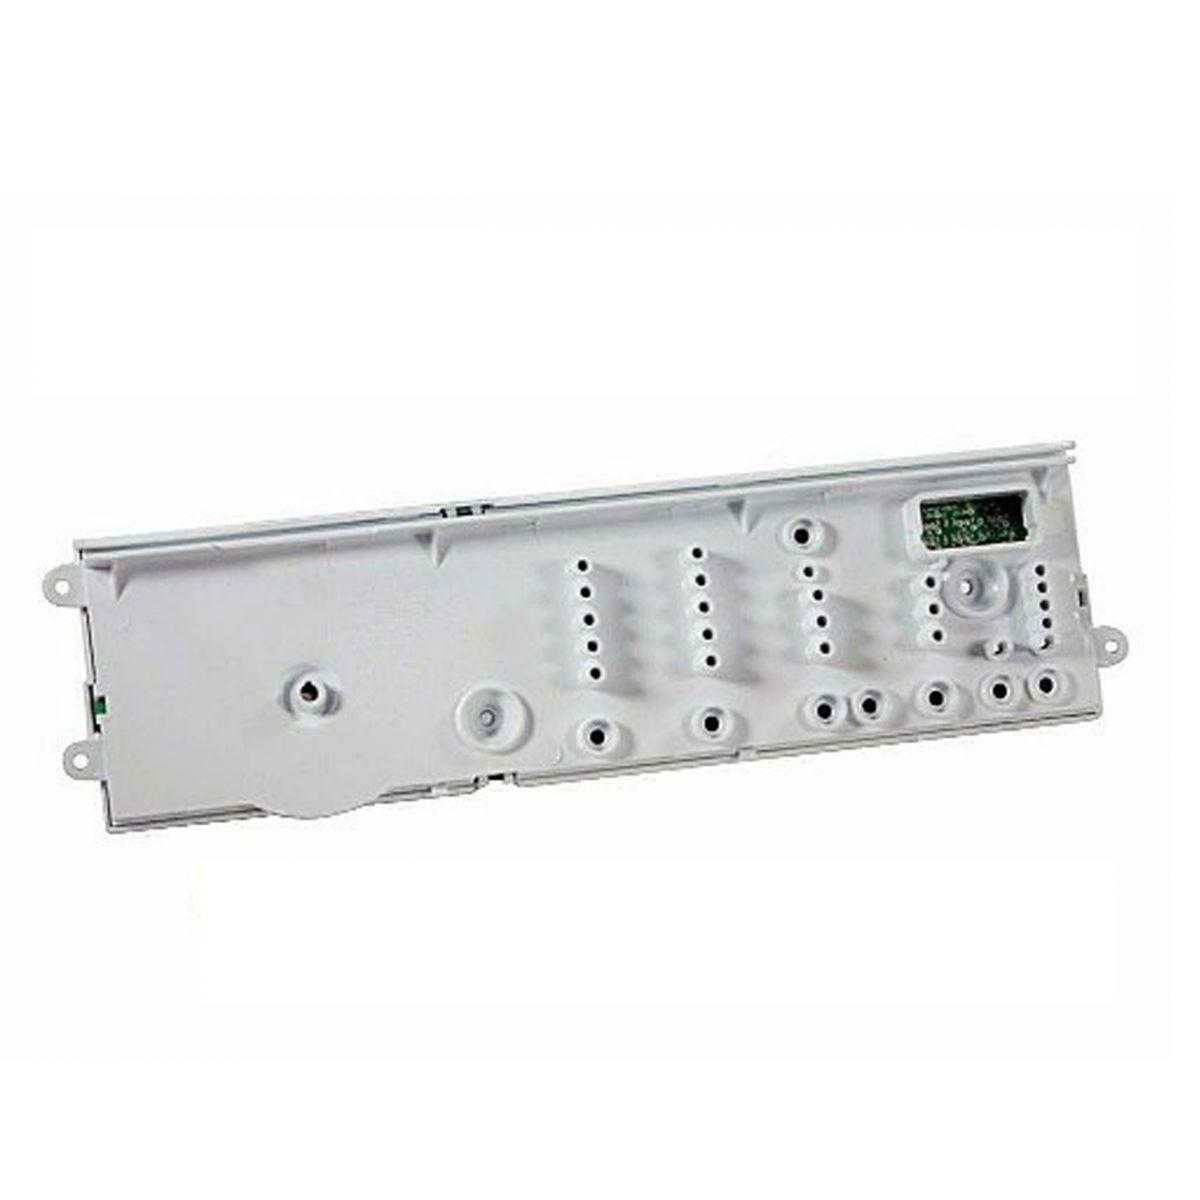 Placa Interface Lavadora Electrolux Trw12 137007030